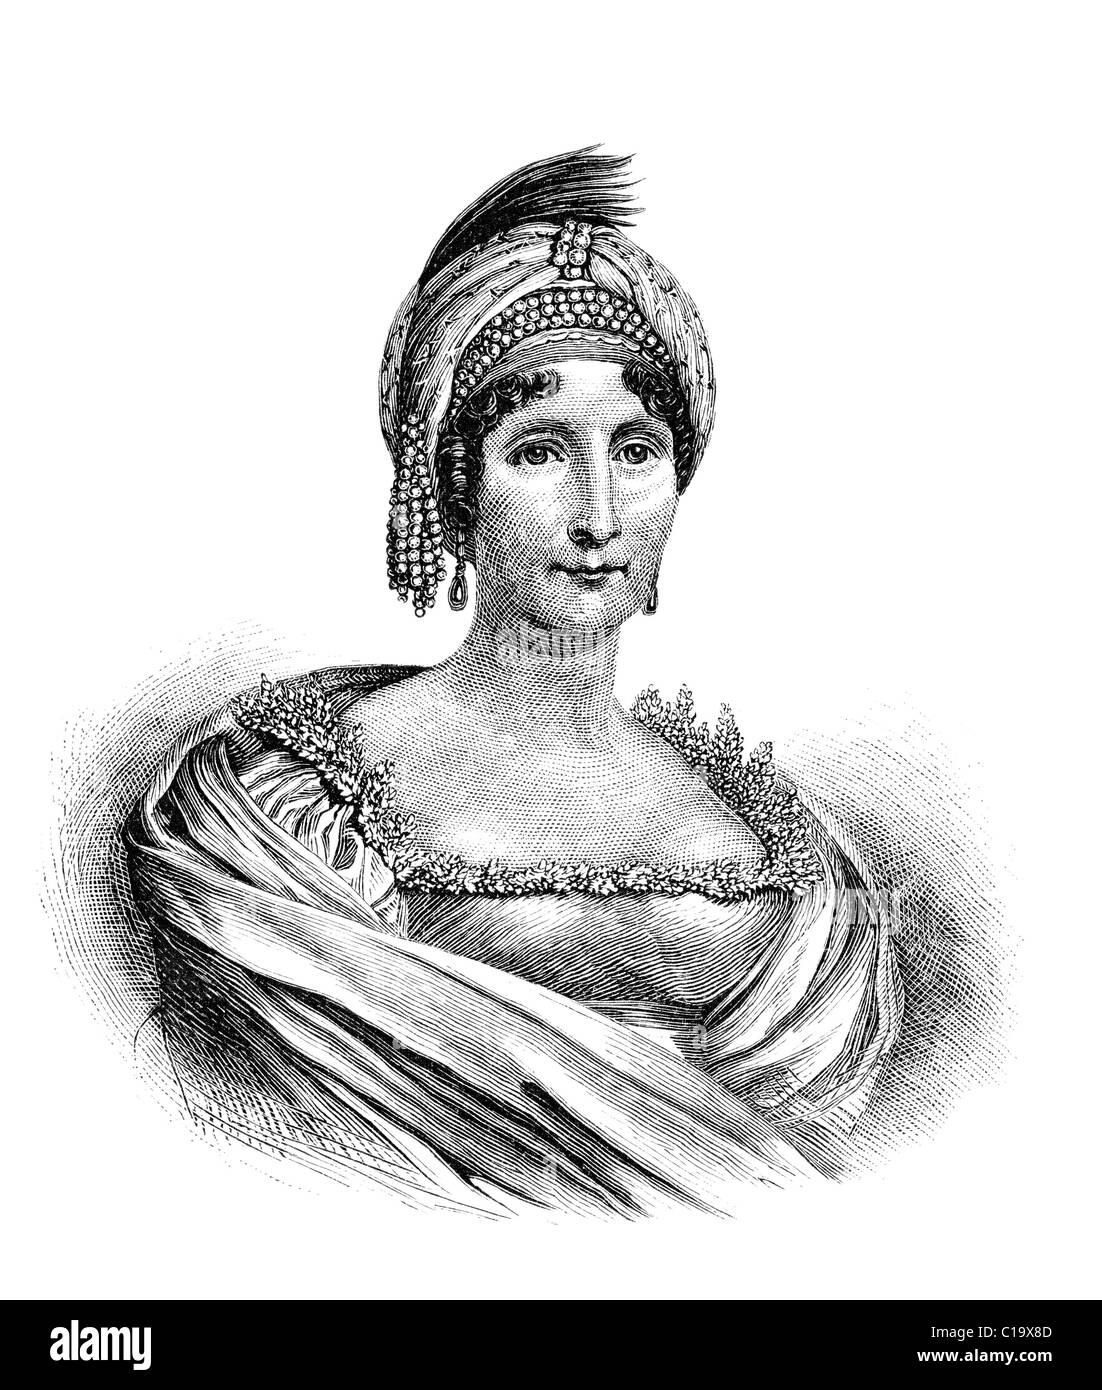 Nobile Maria Letizia Buonaparte was the mother of Napoleon I of France. Stock Photo